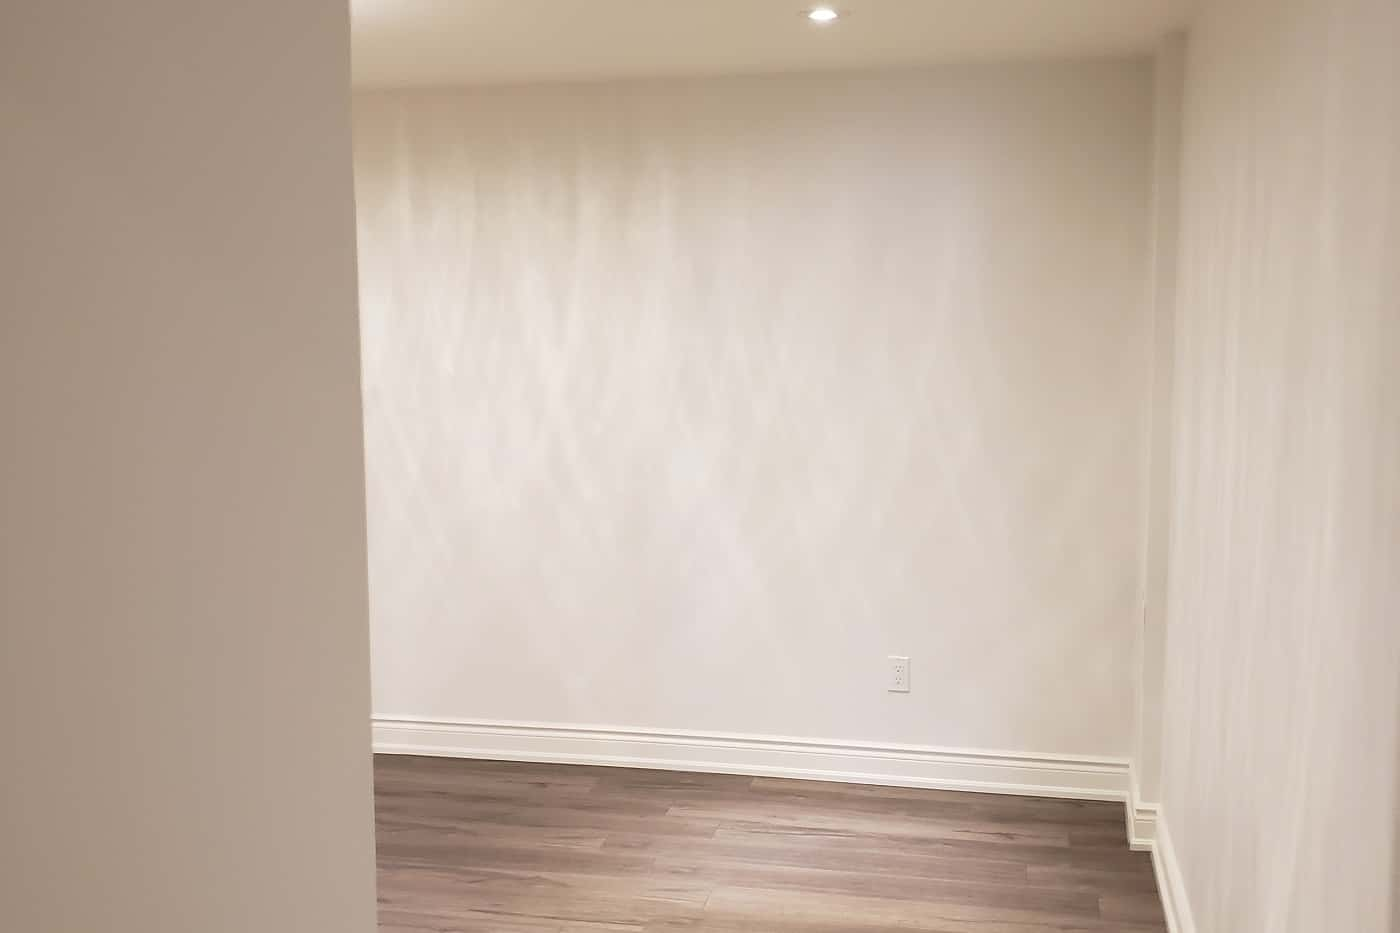 Full basement renovation and transformation Toronto